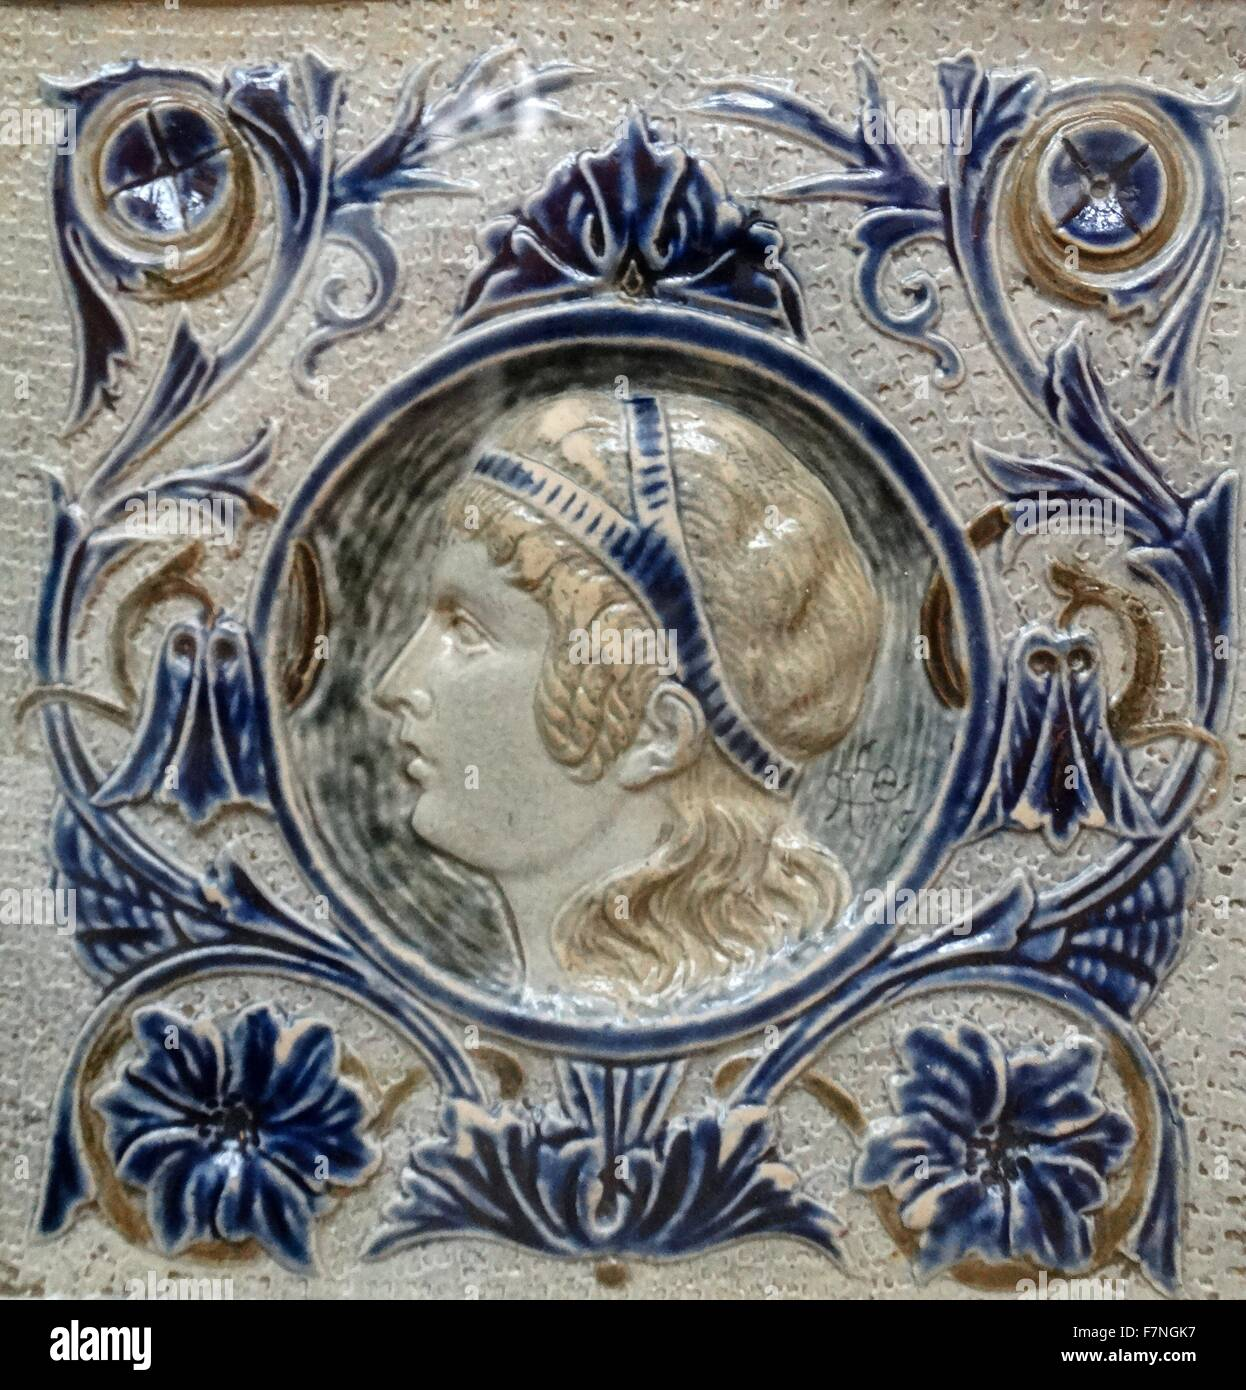 19th Century English ceramic tile - Stock Image